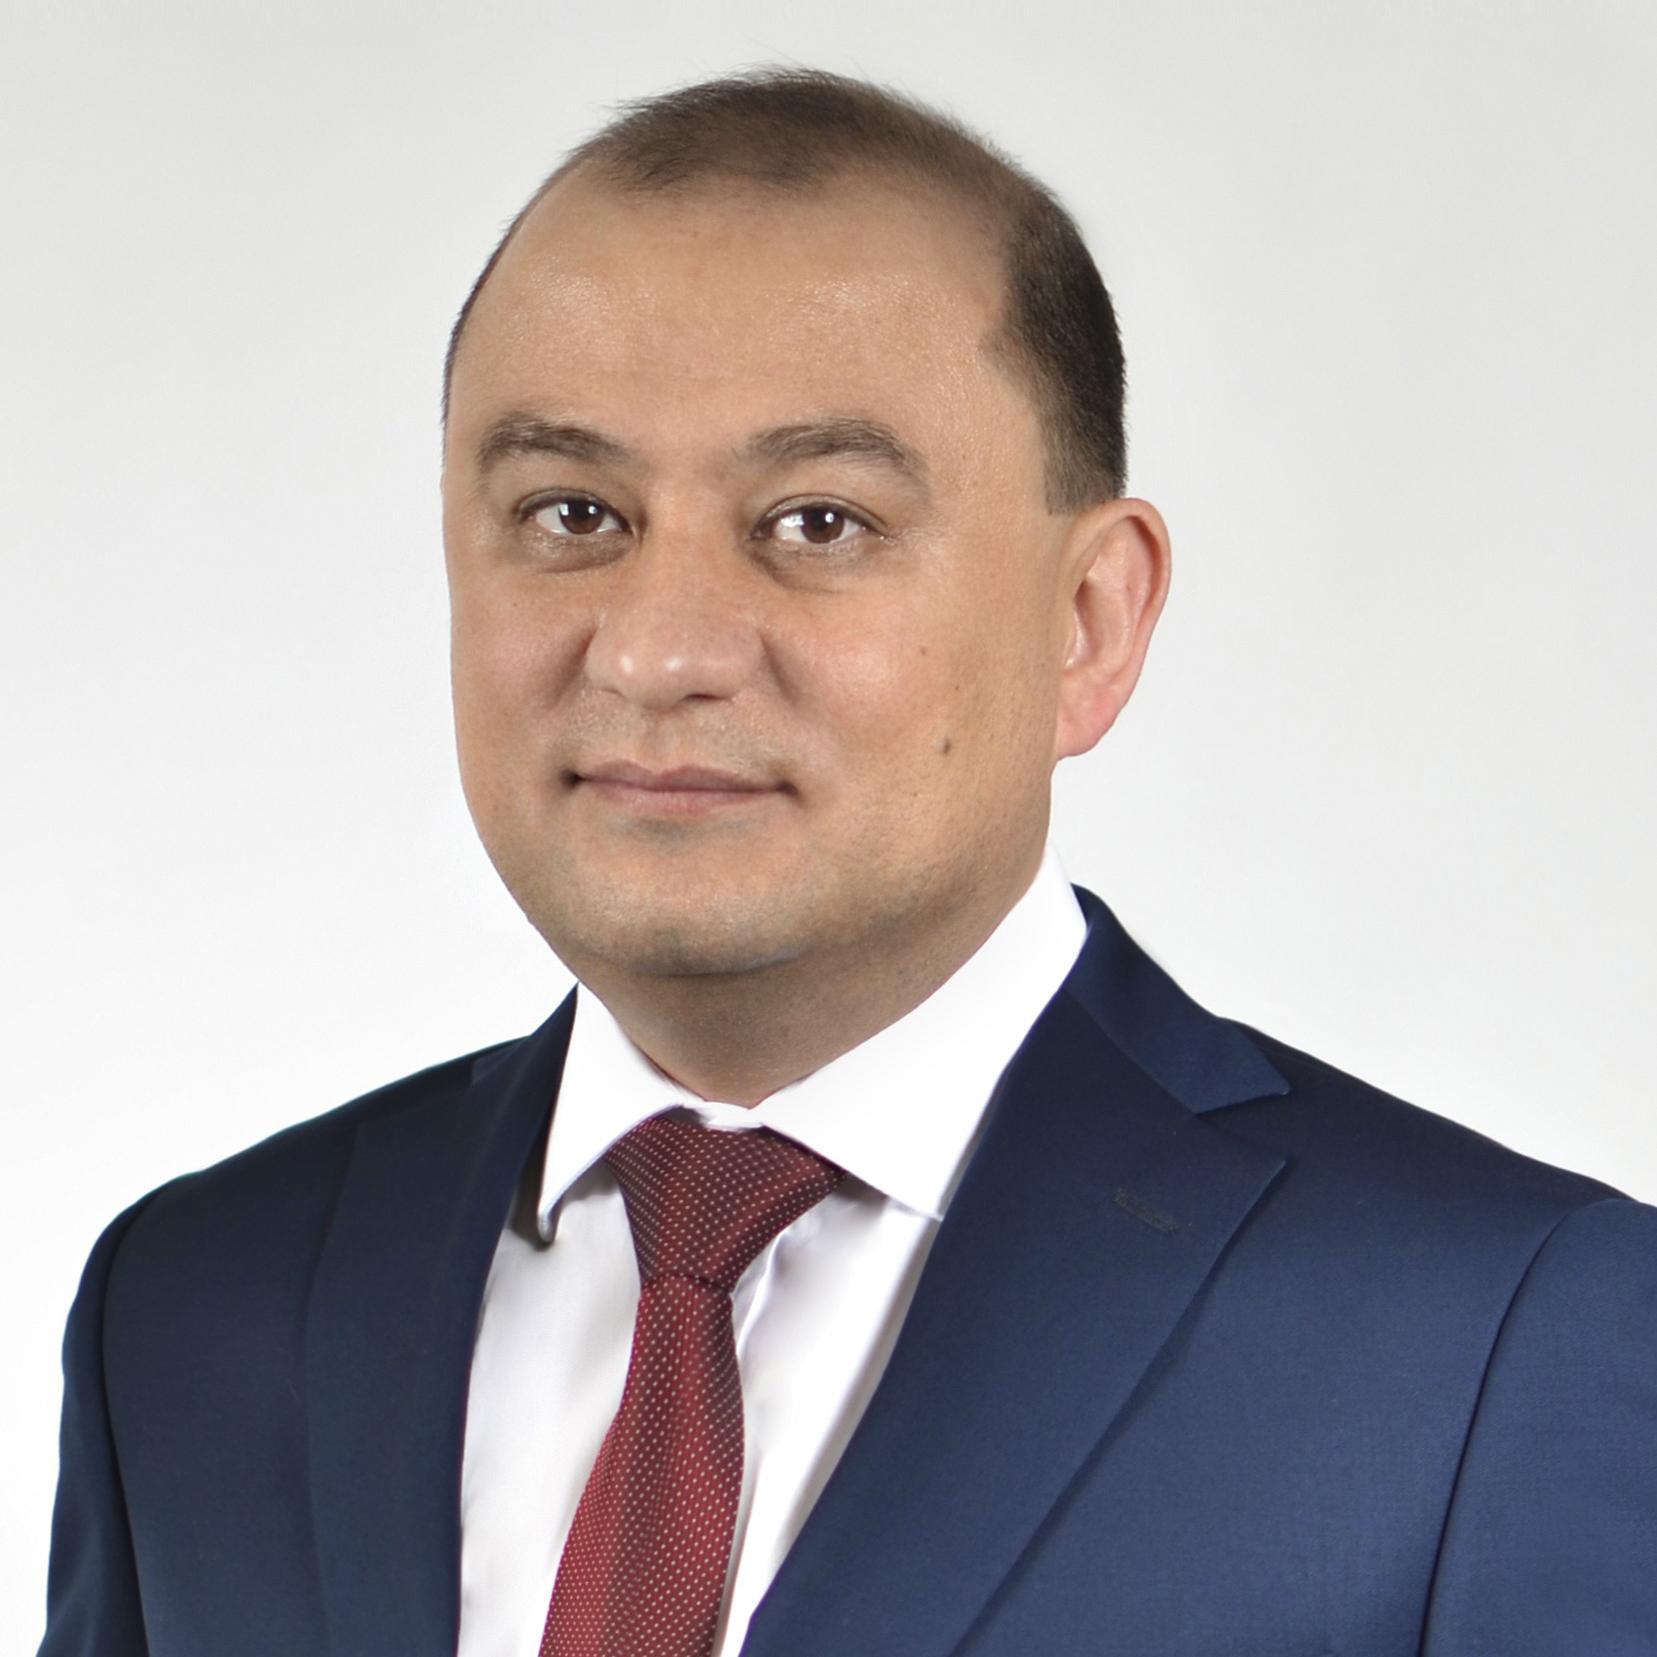 Muzaffar Atamirzaev